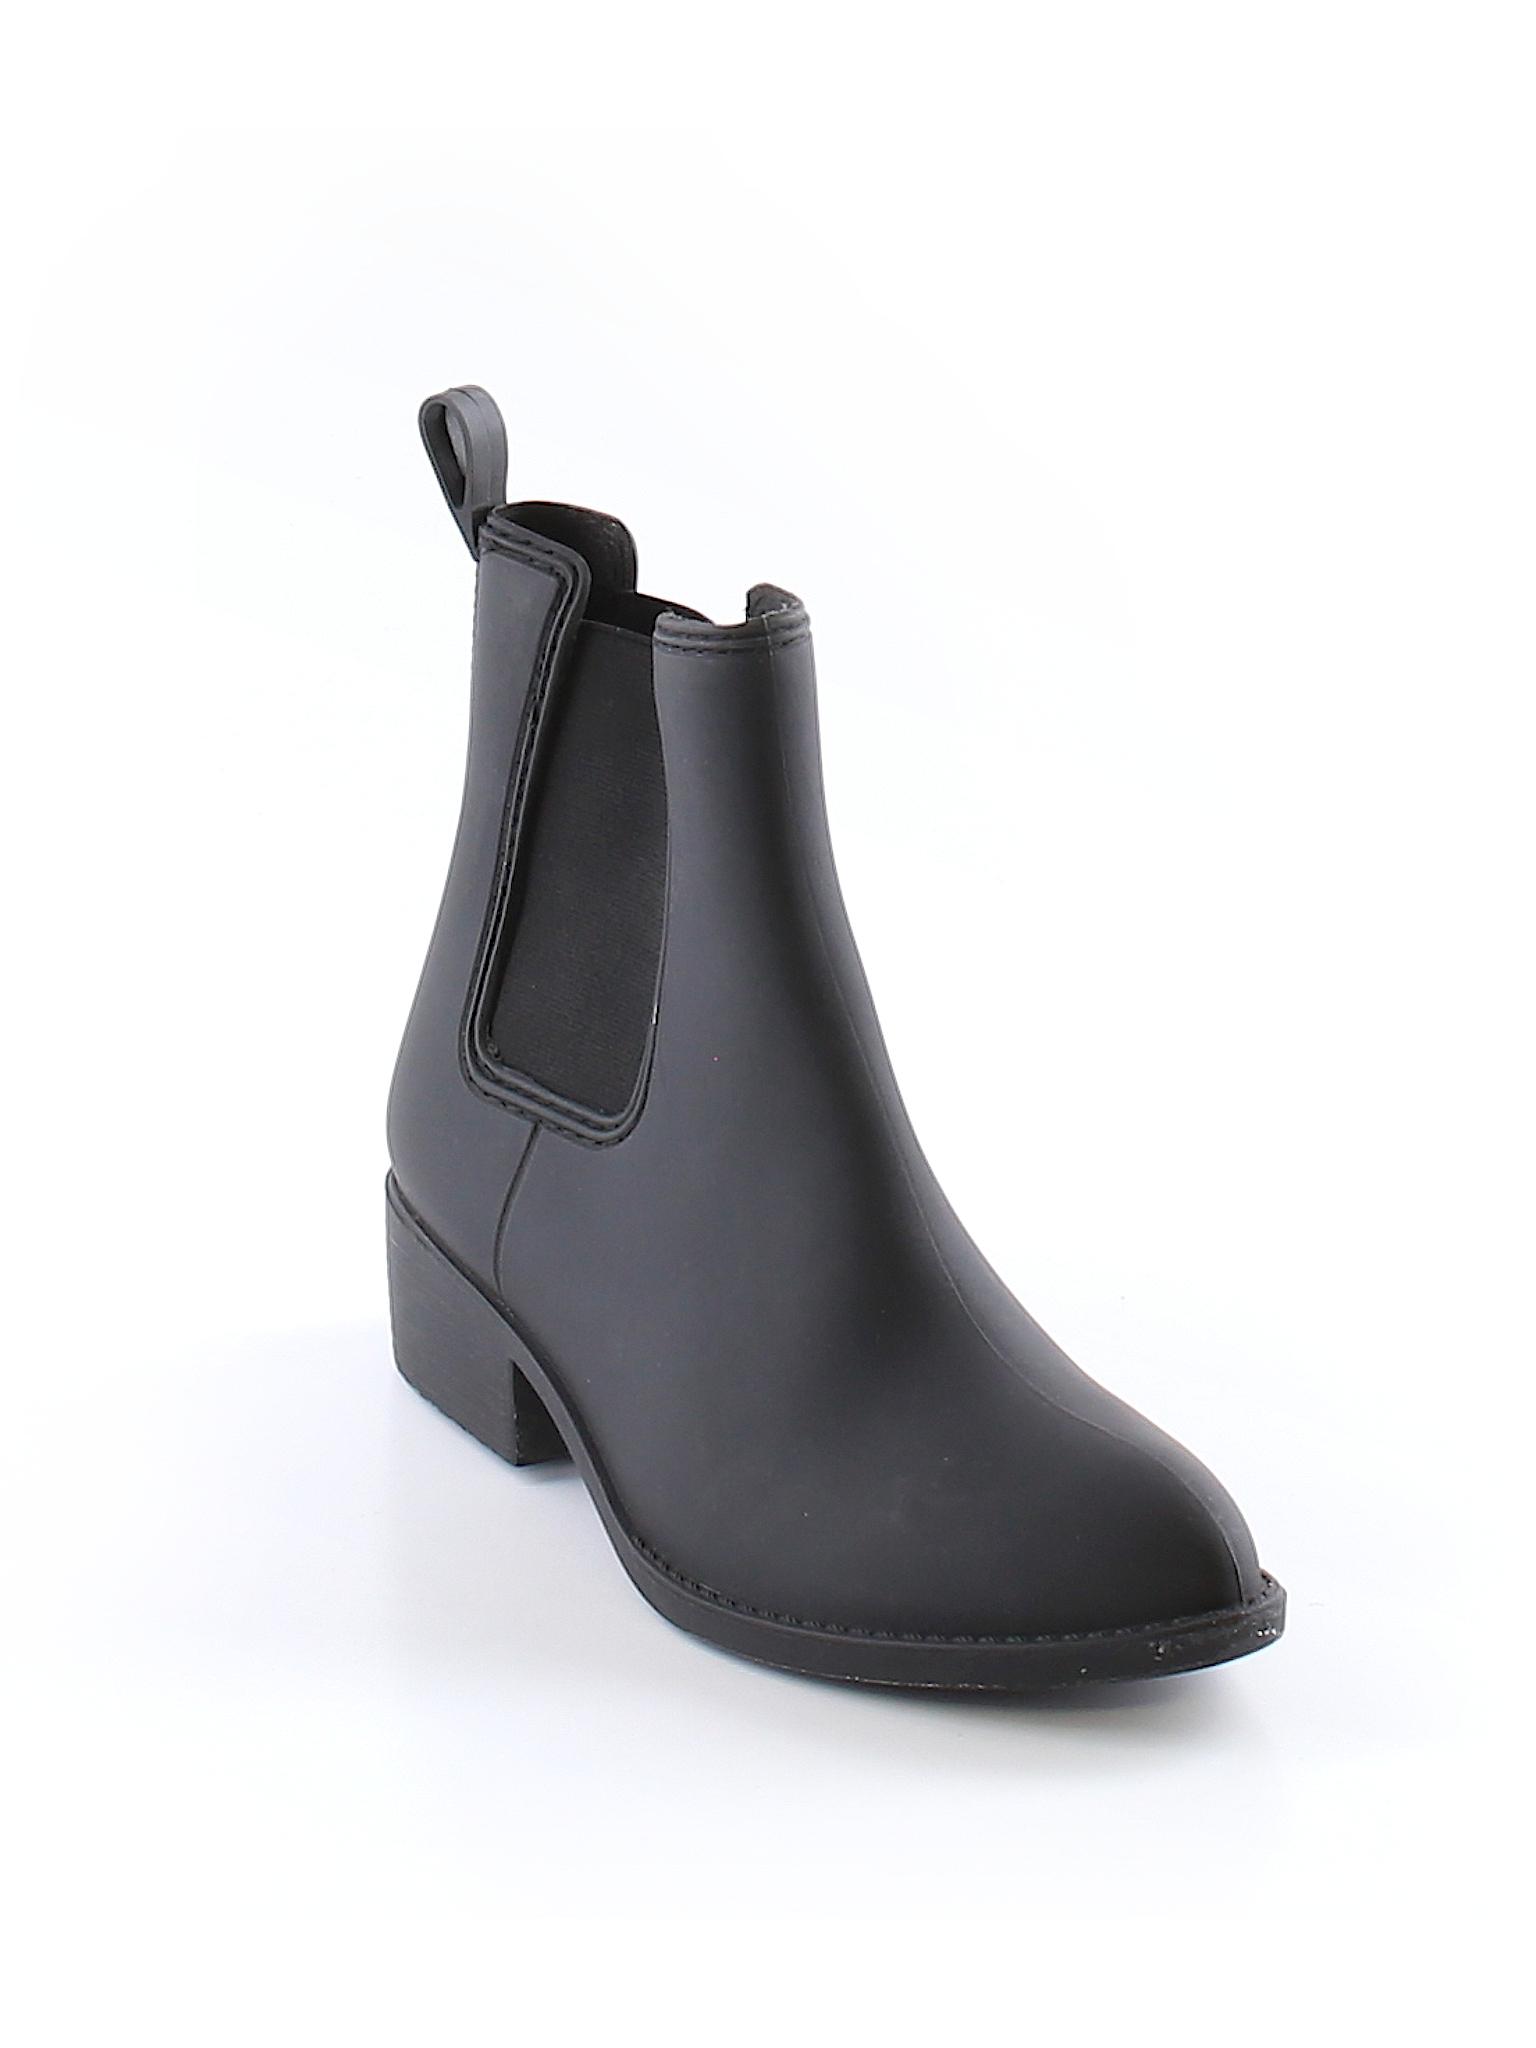 Havana Last Jeffrey Campbell Solid Black Boots Size 9 69